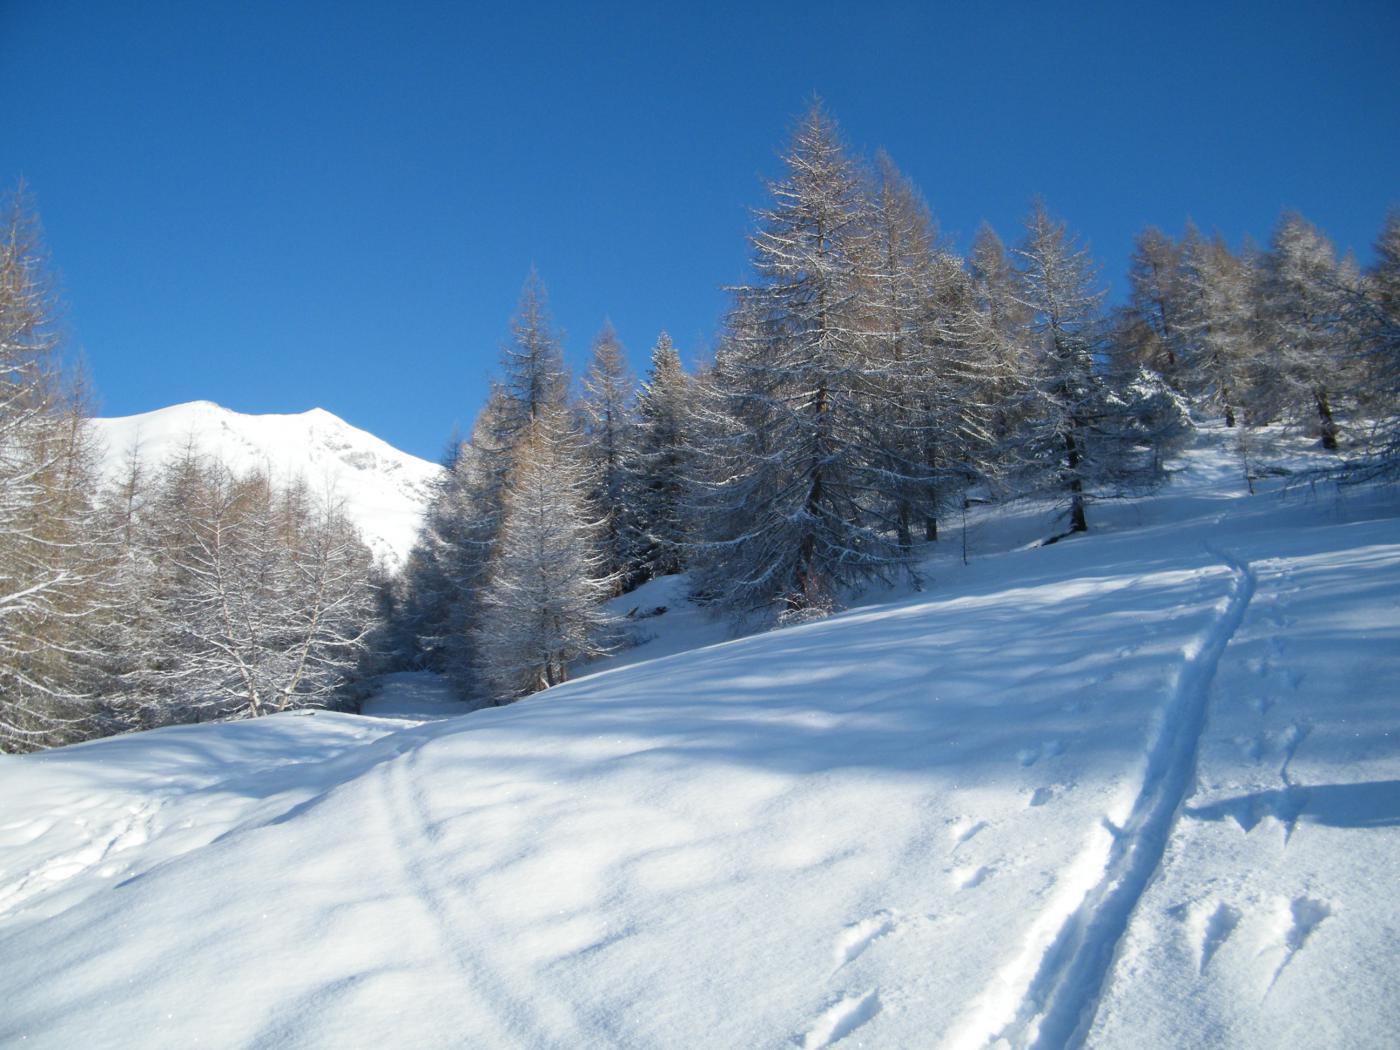 paesaggio invernale stamattina